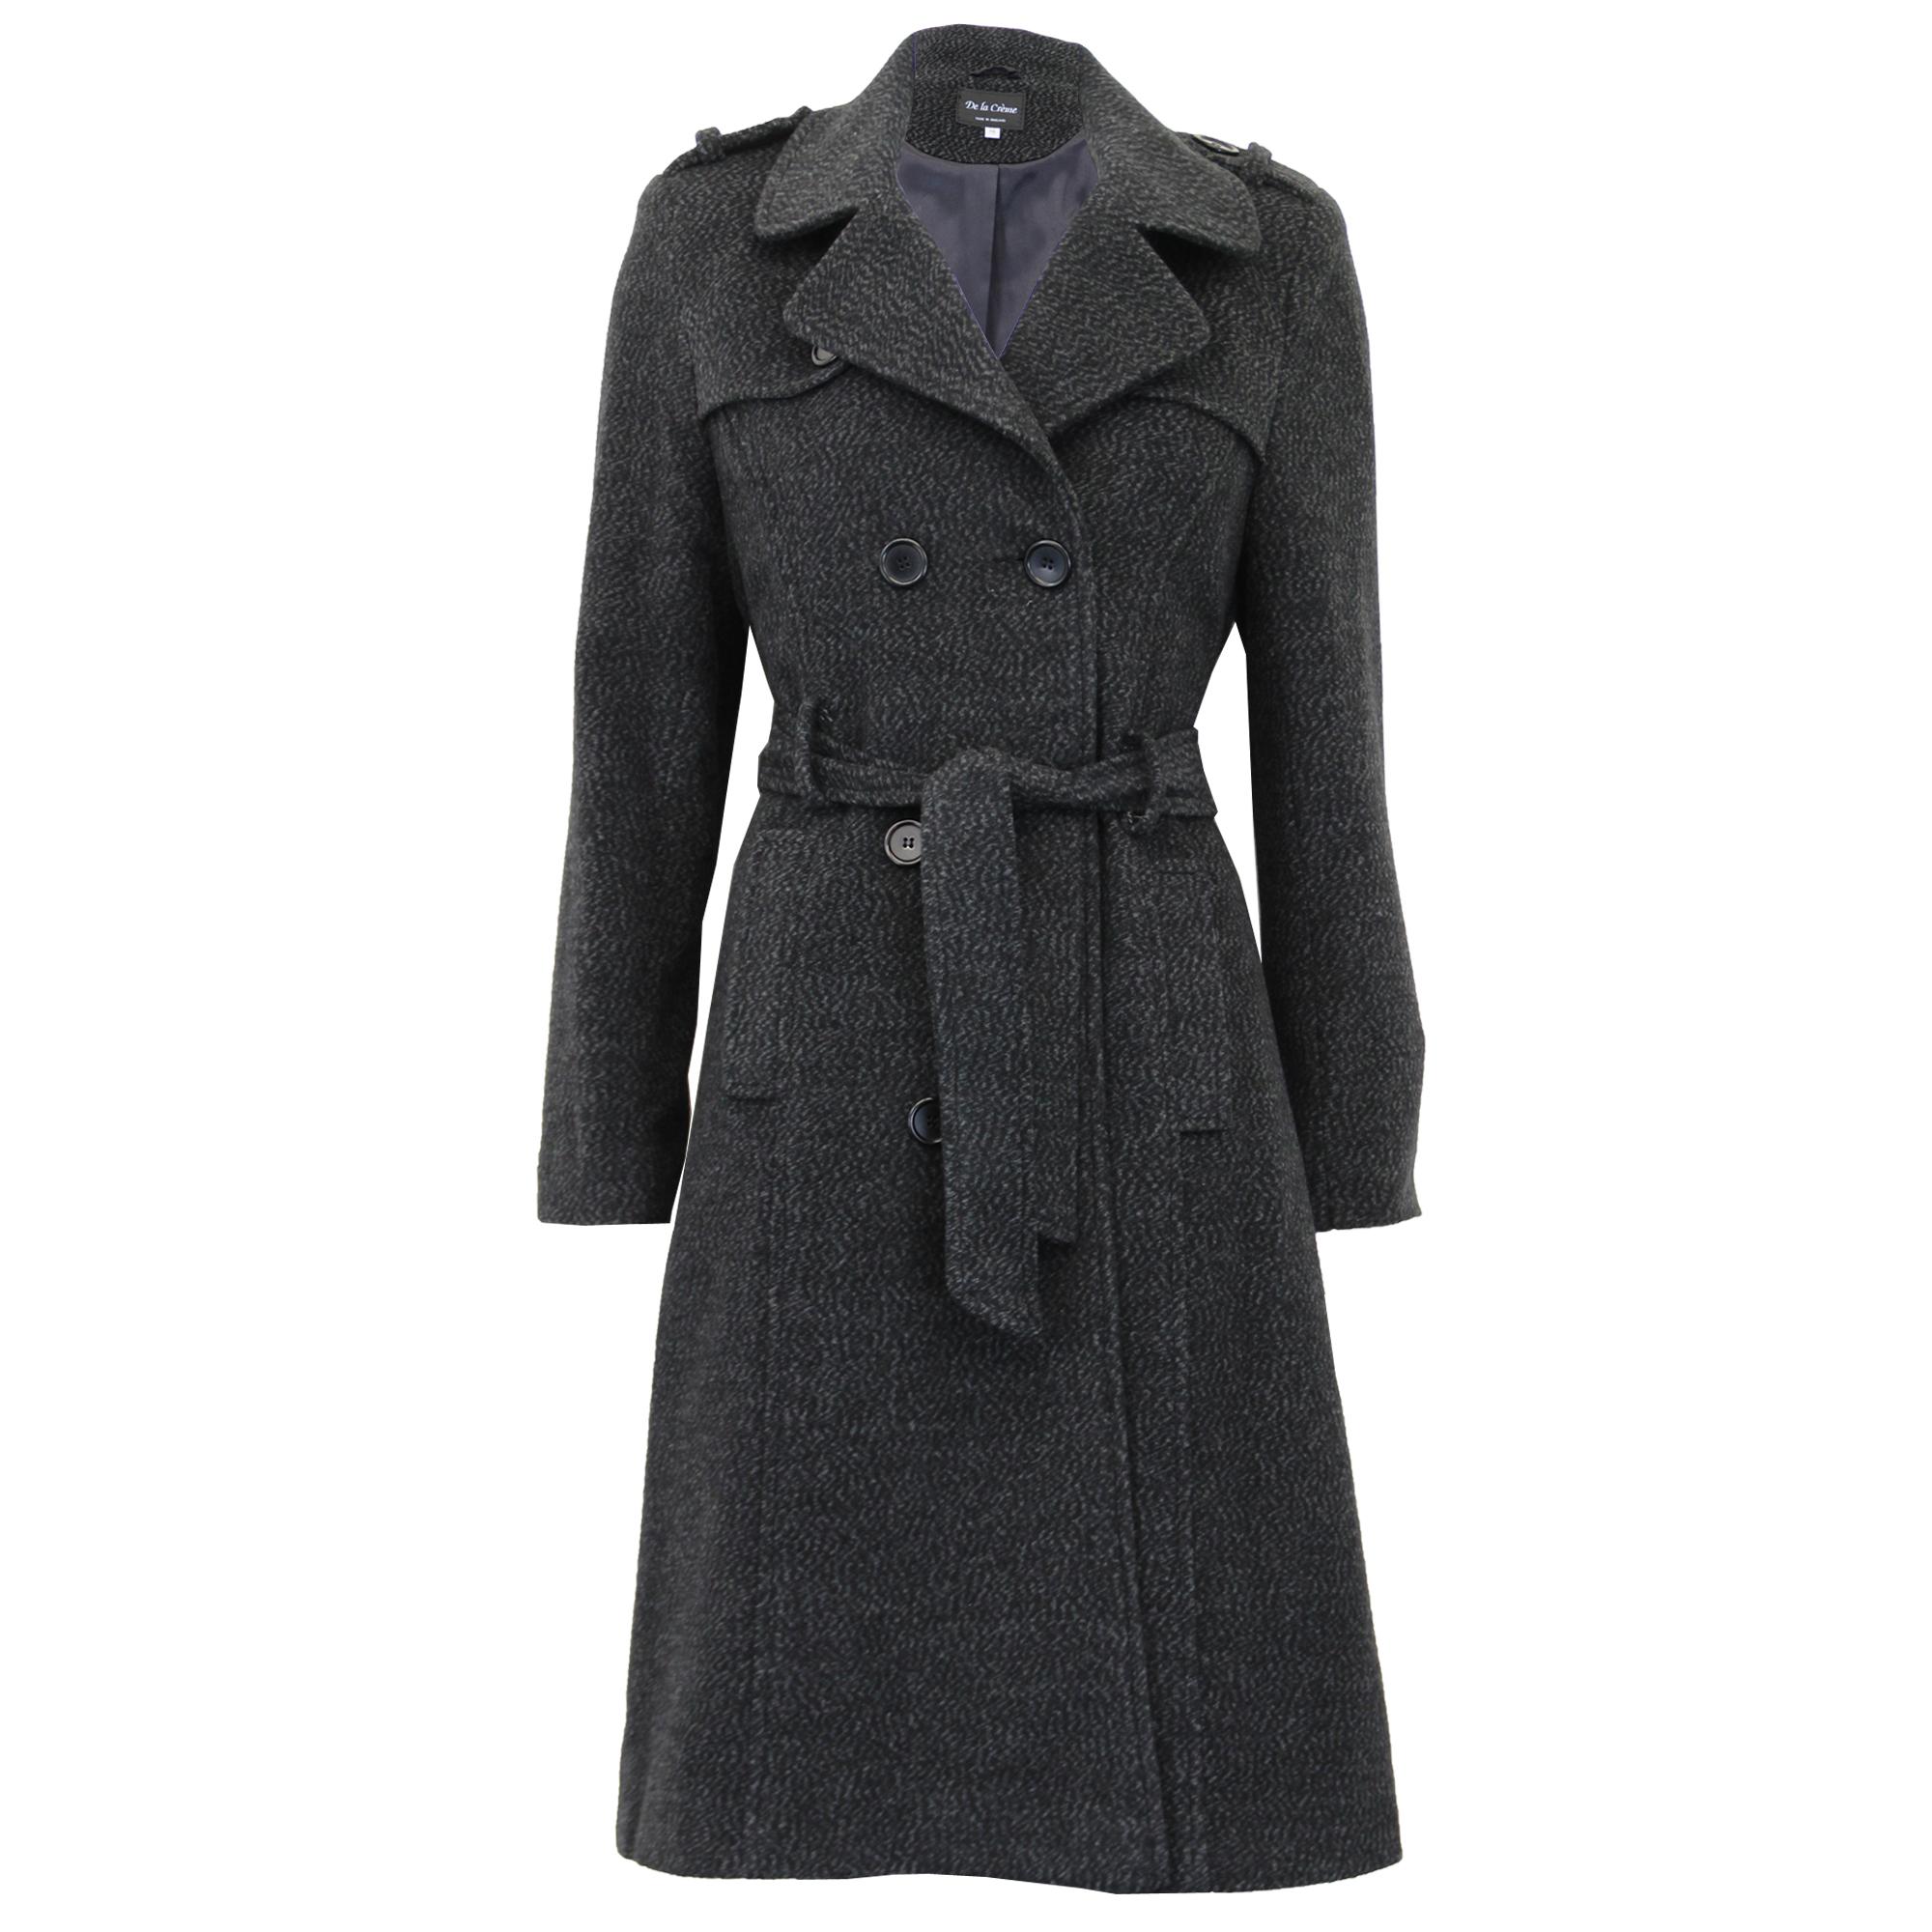 779e584cedf Ladies Wool Coat Womens Long Jacket Double Breasted Belt Outerwear ...